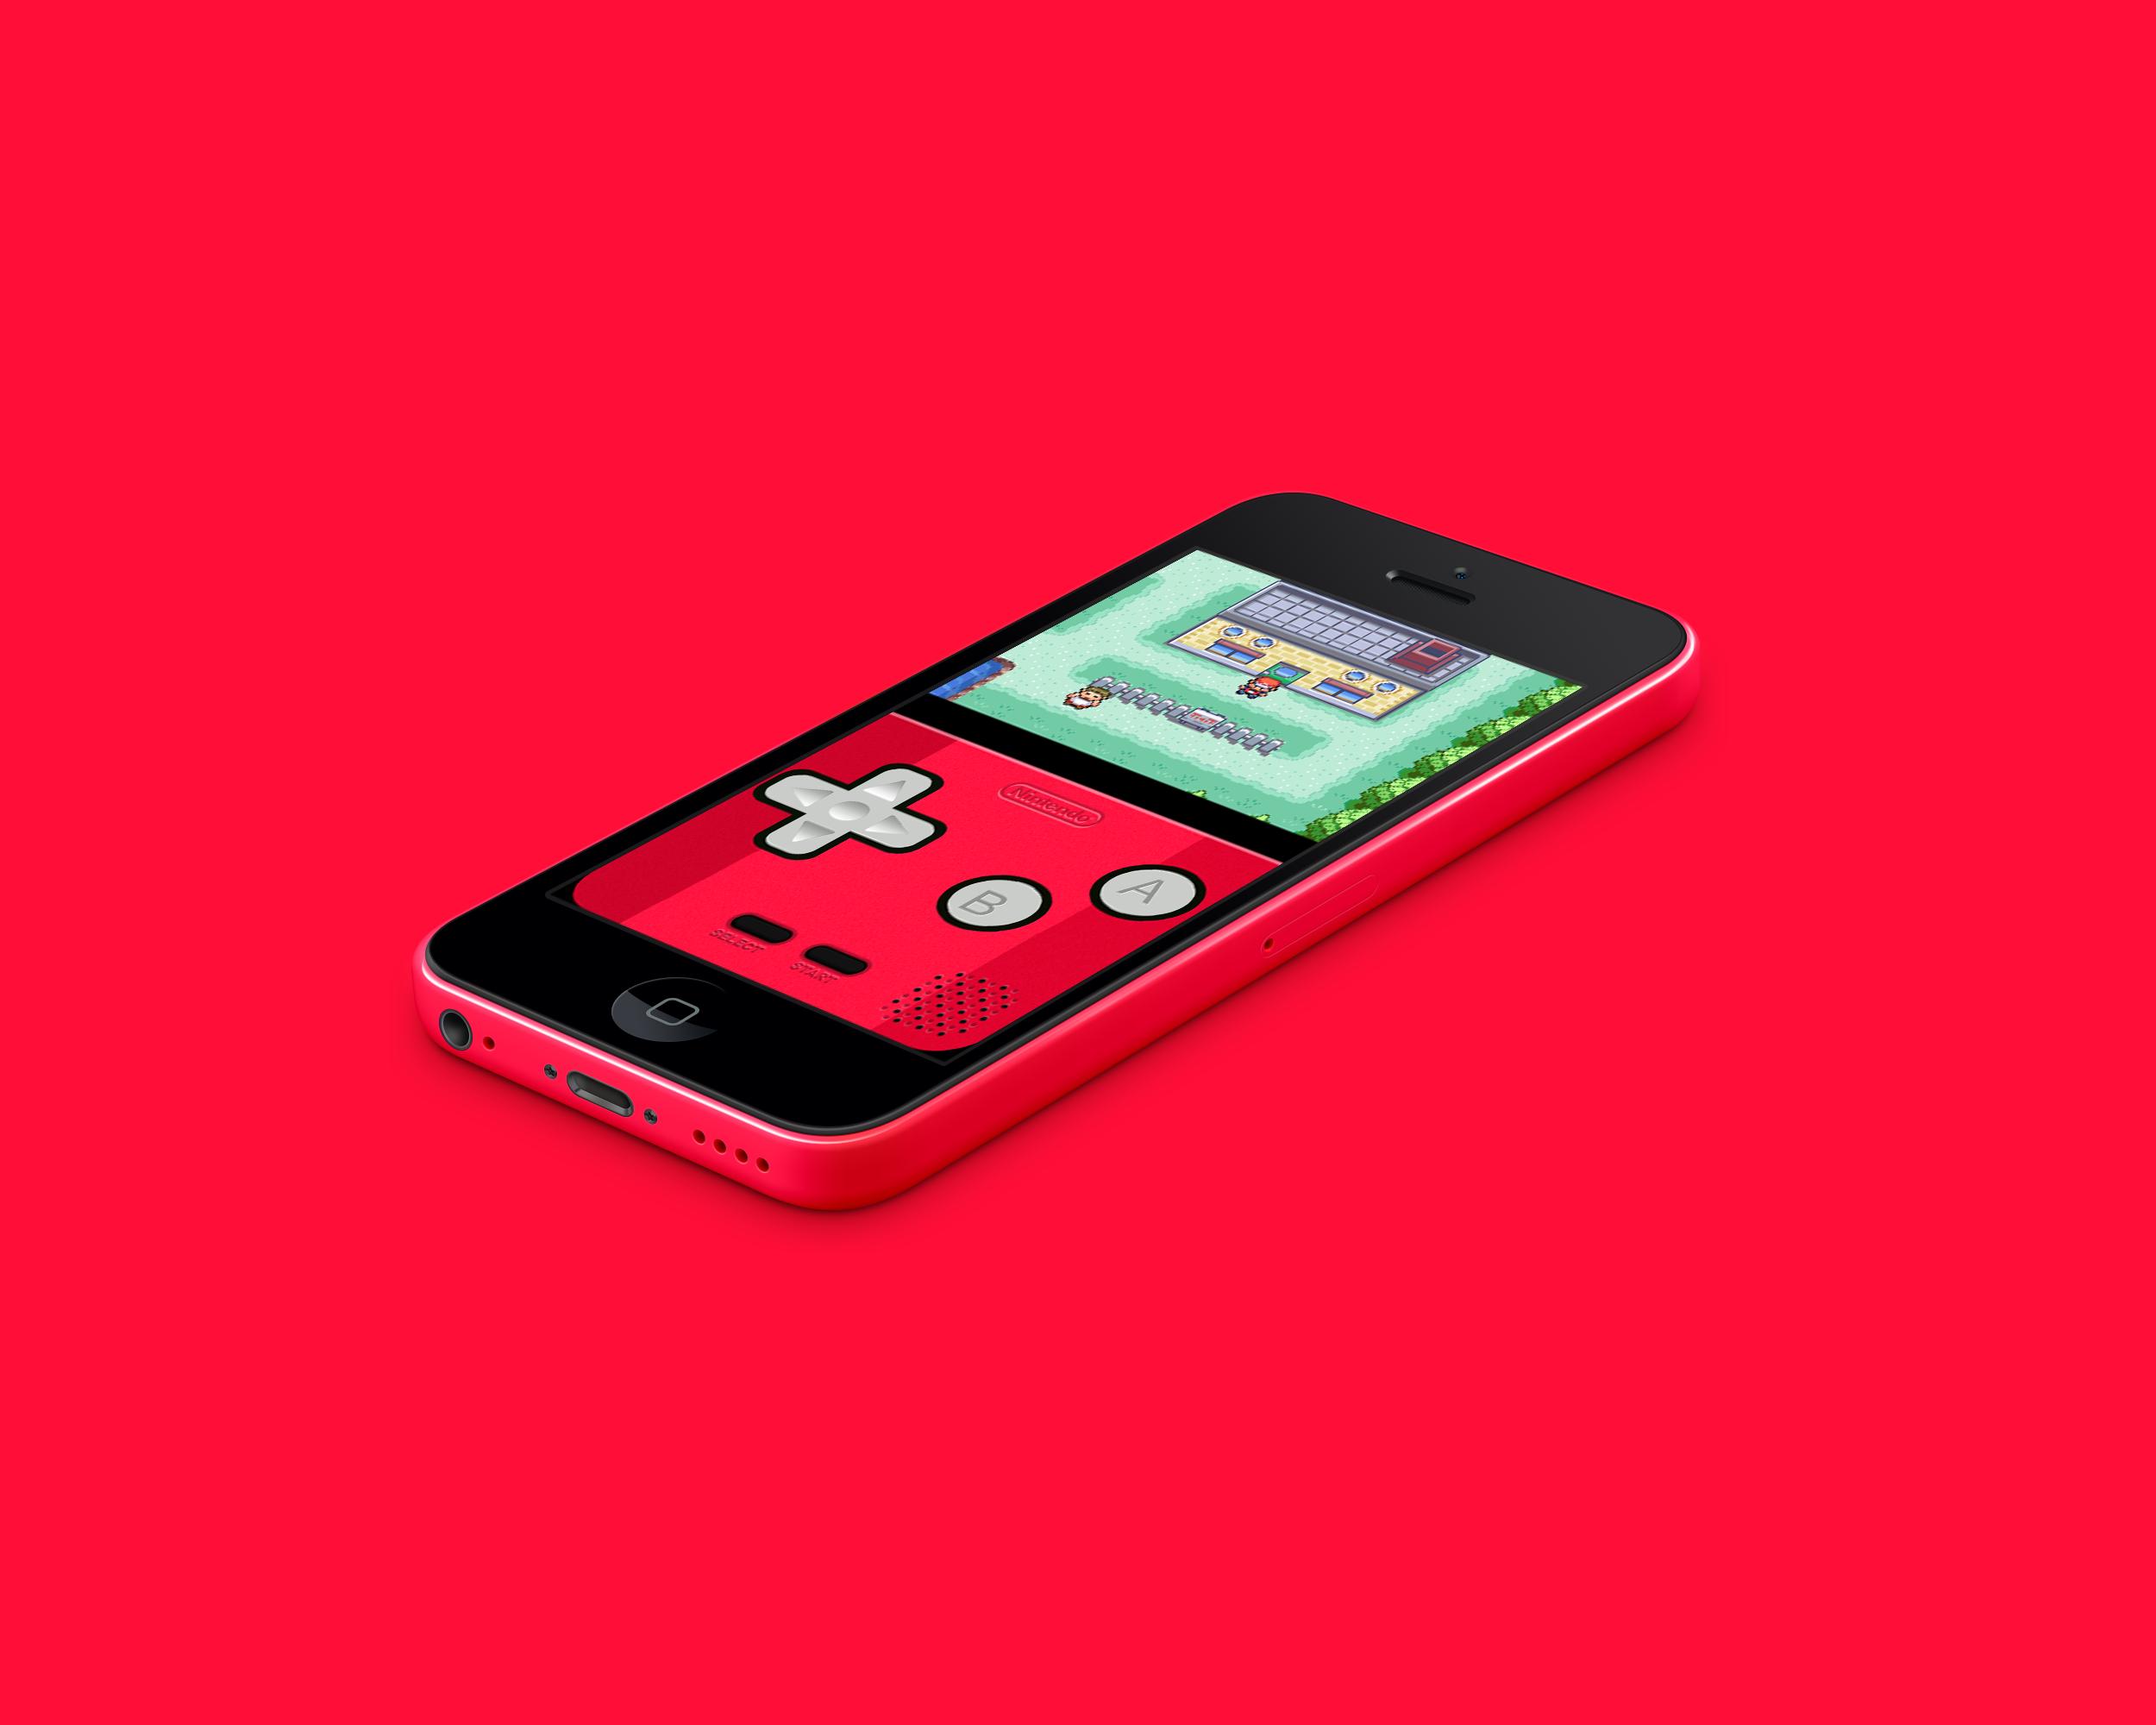 IPhone 5c GBA Red By Vitalovitalo On DeviantArt